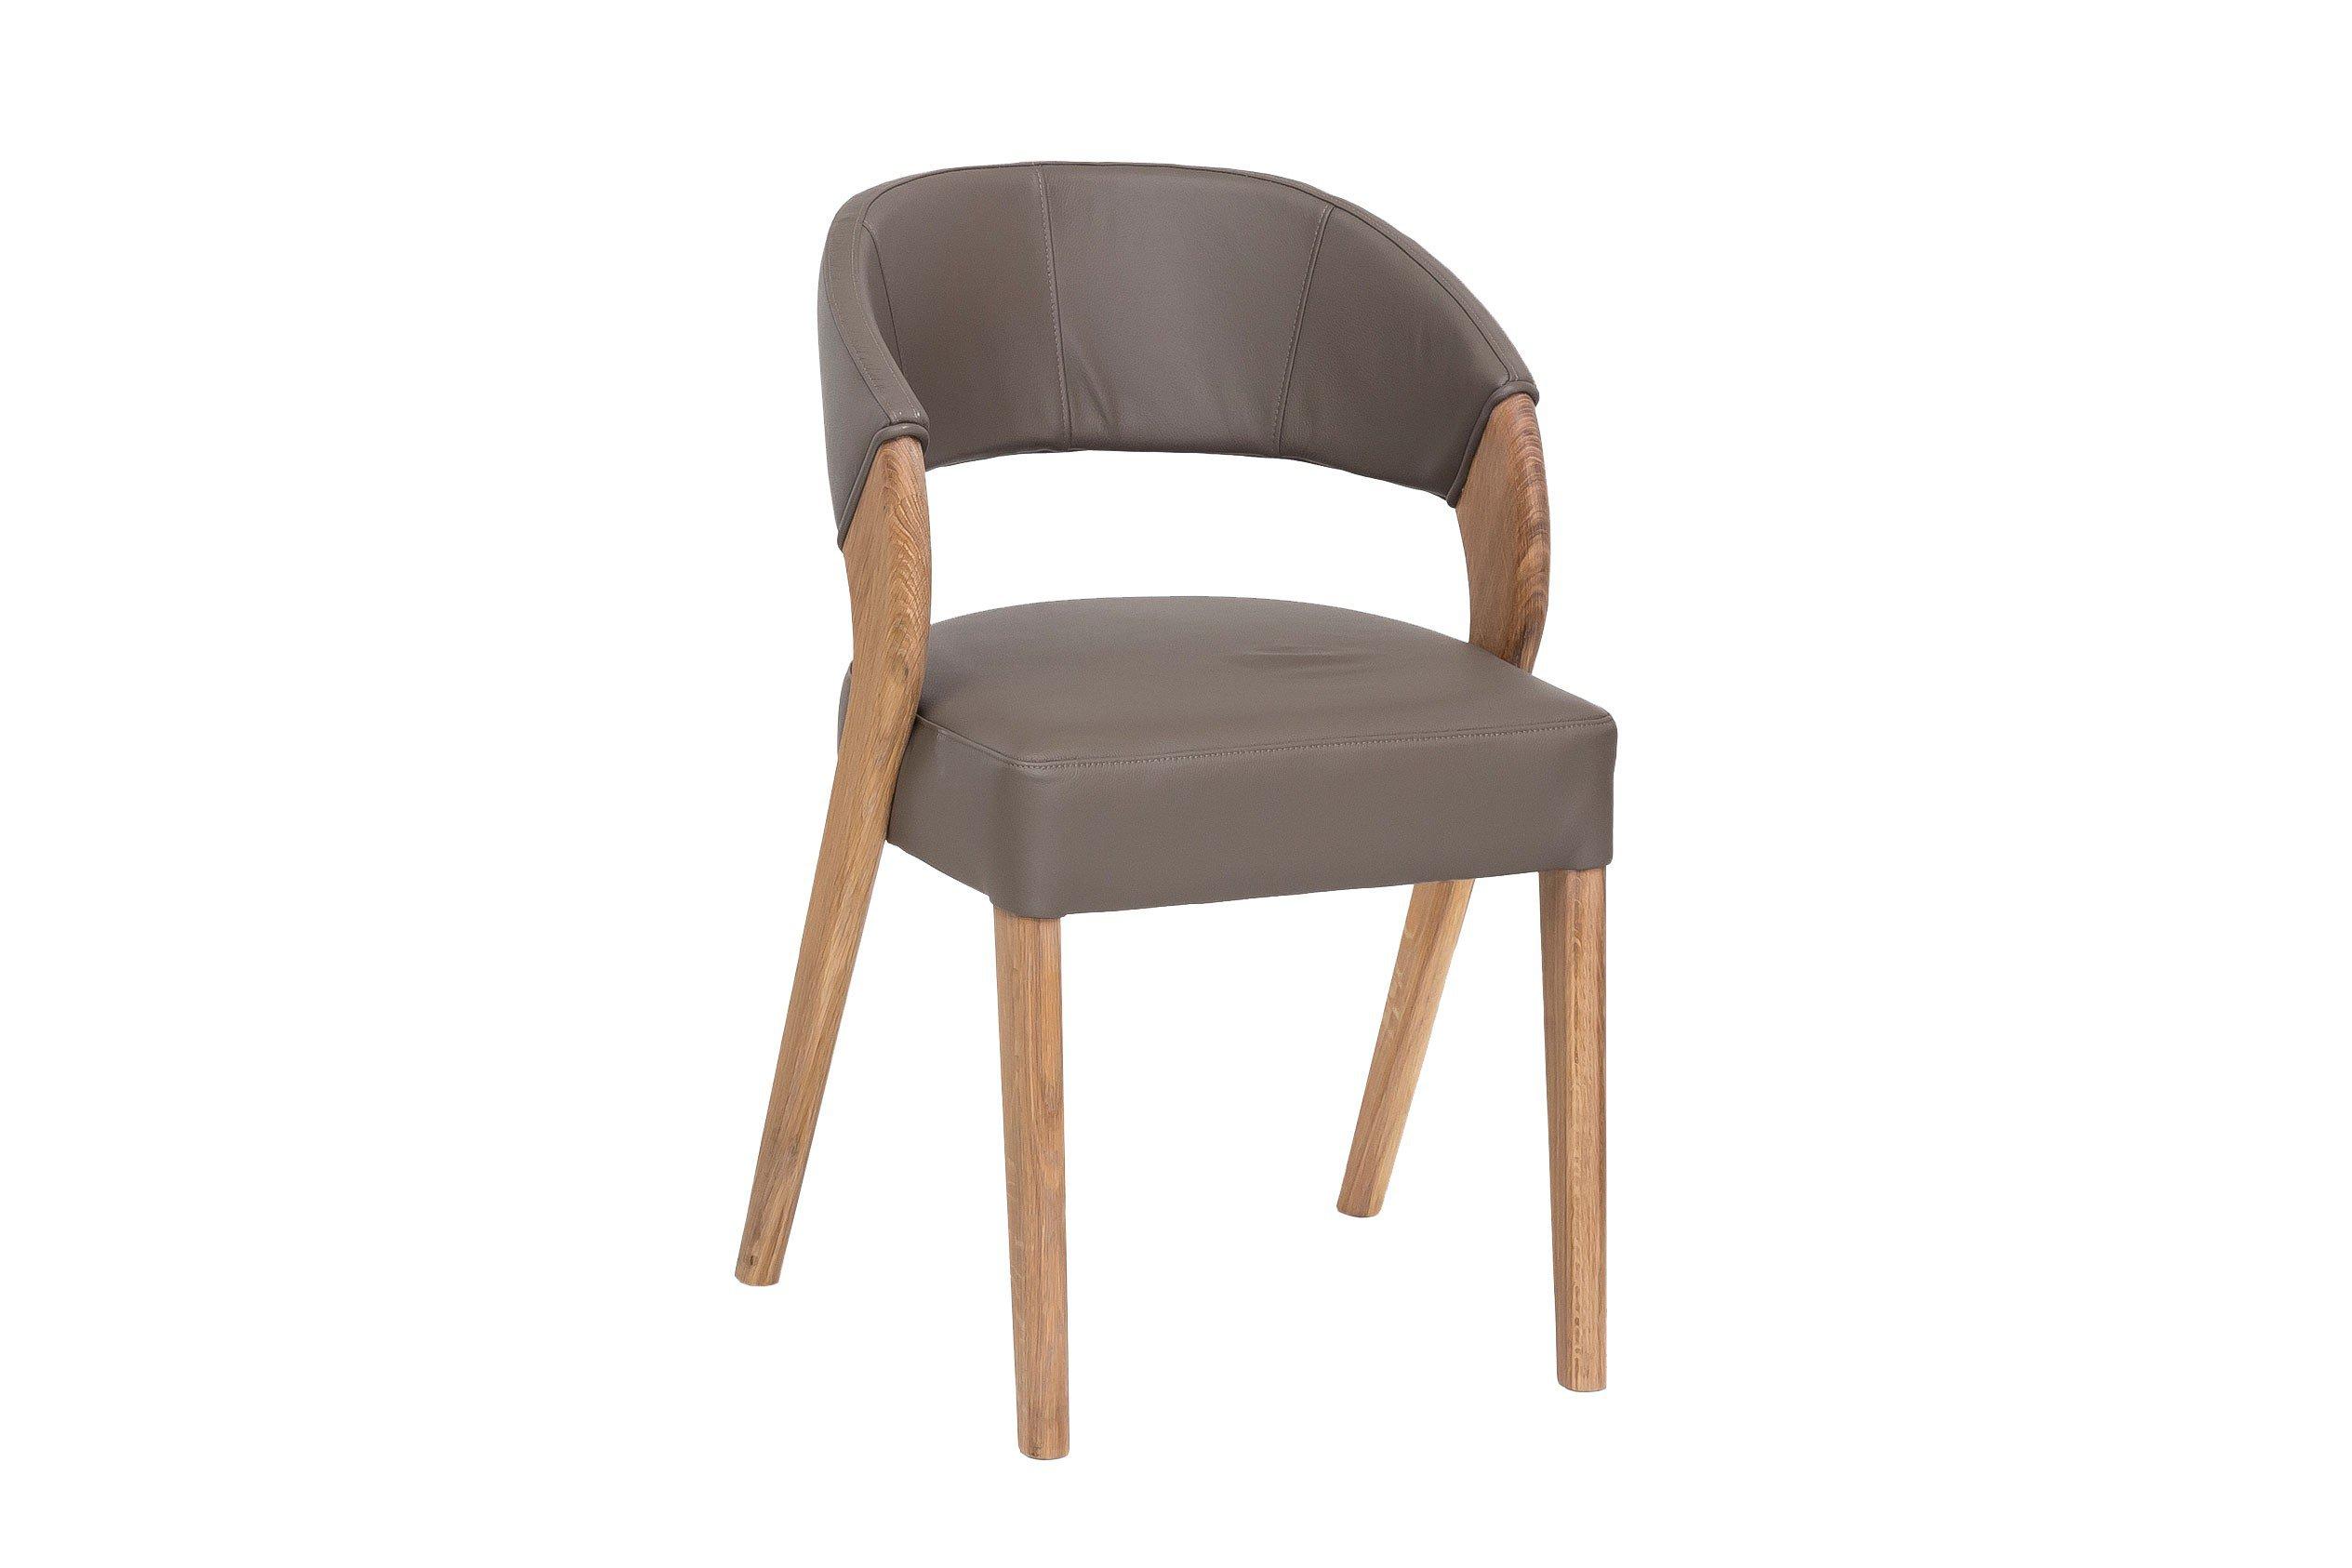 almada 1 von standard furniture stuhl mit lederbezug steingrau